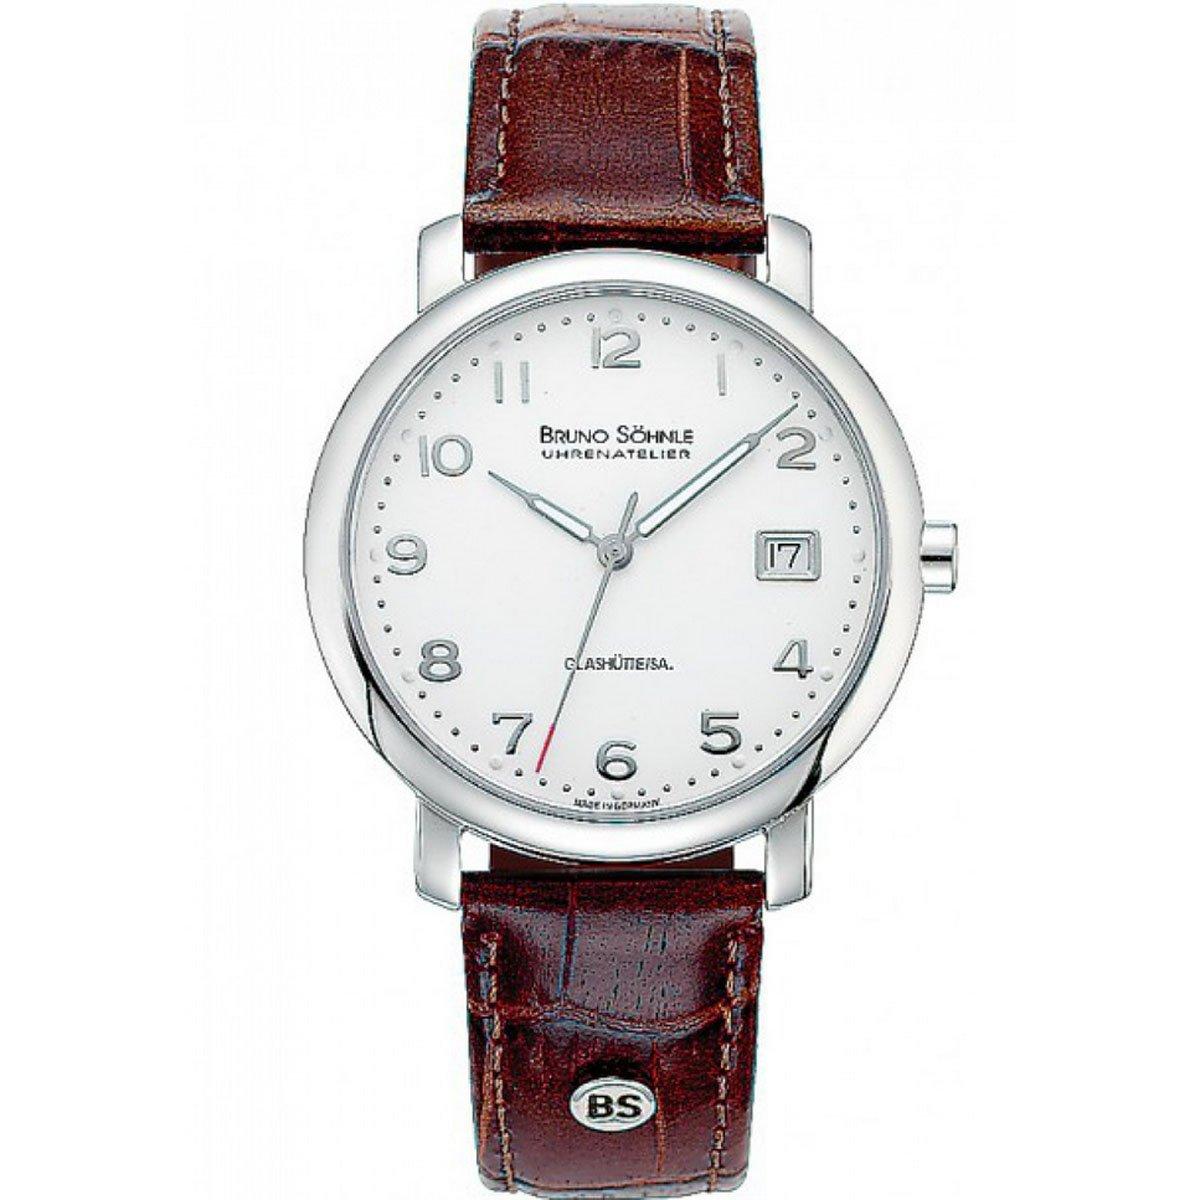 Herren-Armbanduhr Momento Analog Quarz Leder 17-13016-223